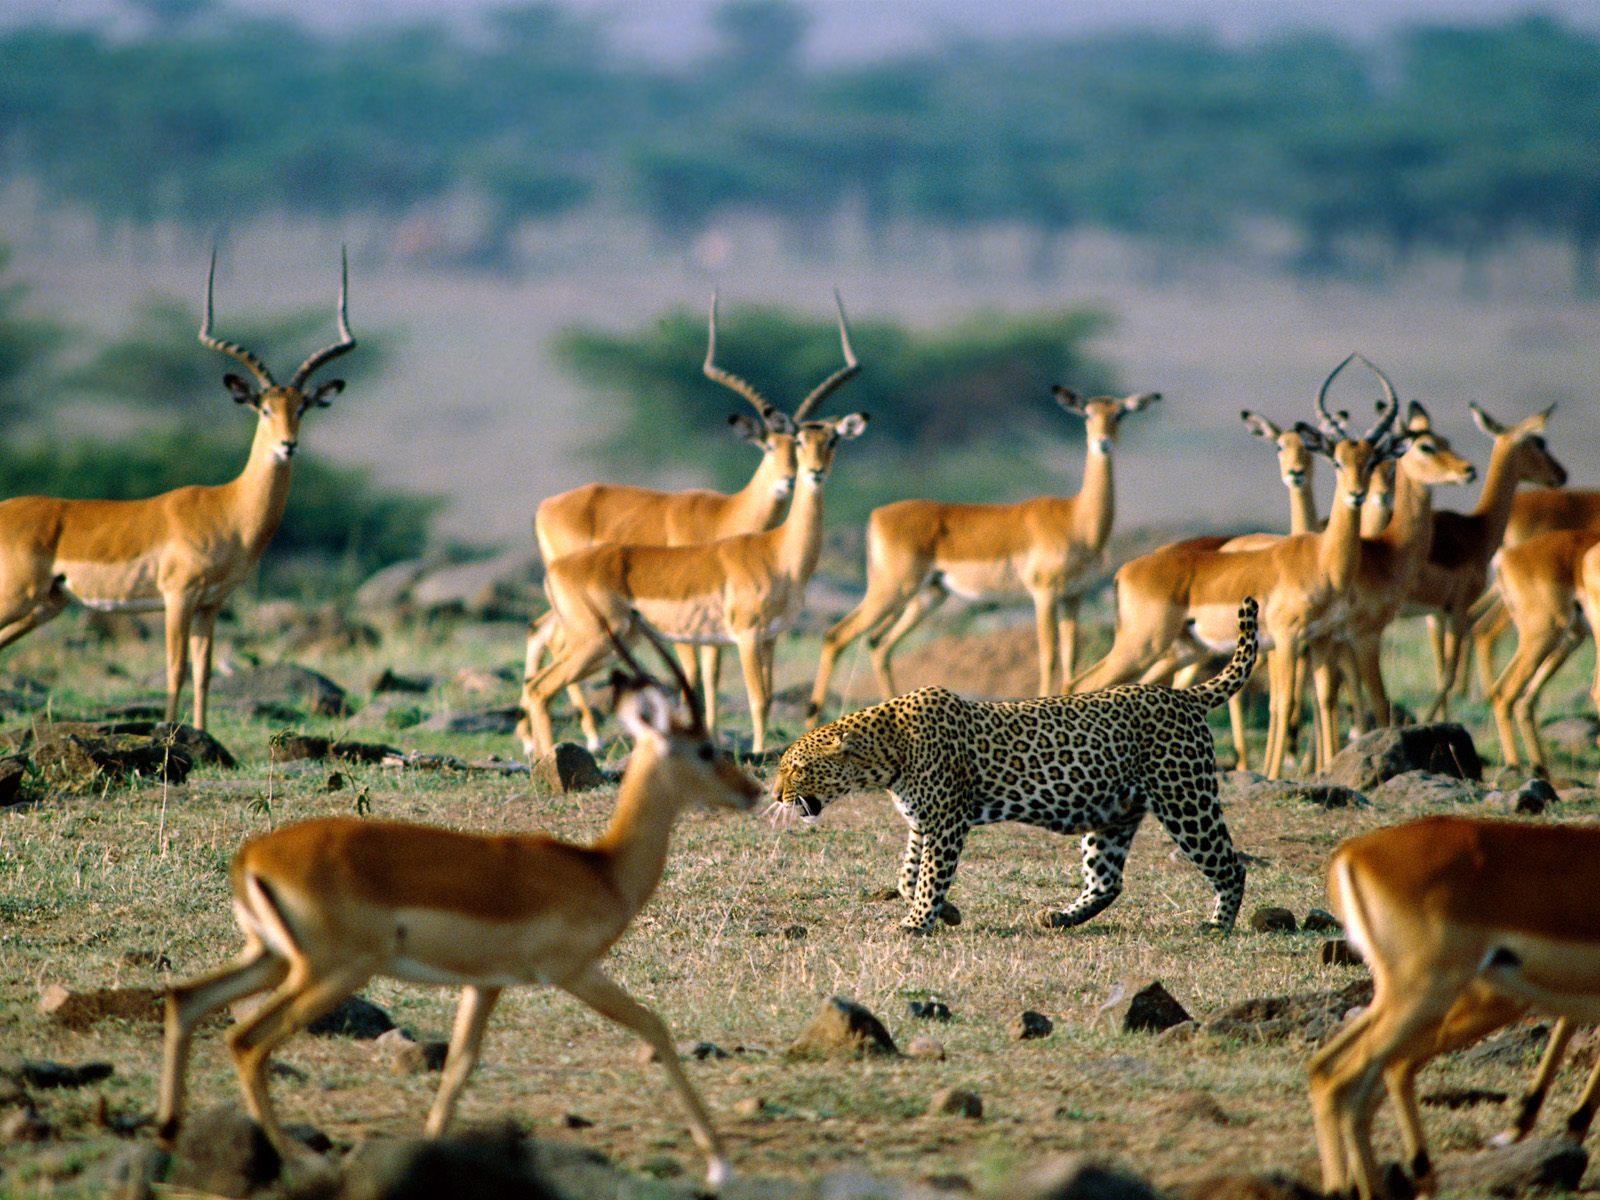 Afrika - Page 15 Leopard_impalas+1600x1200